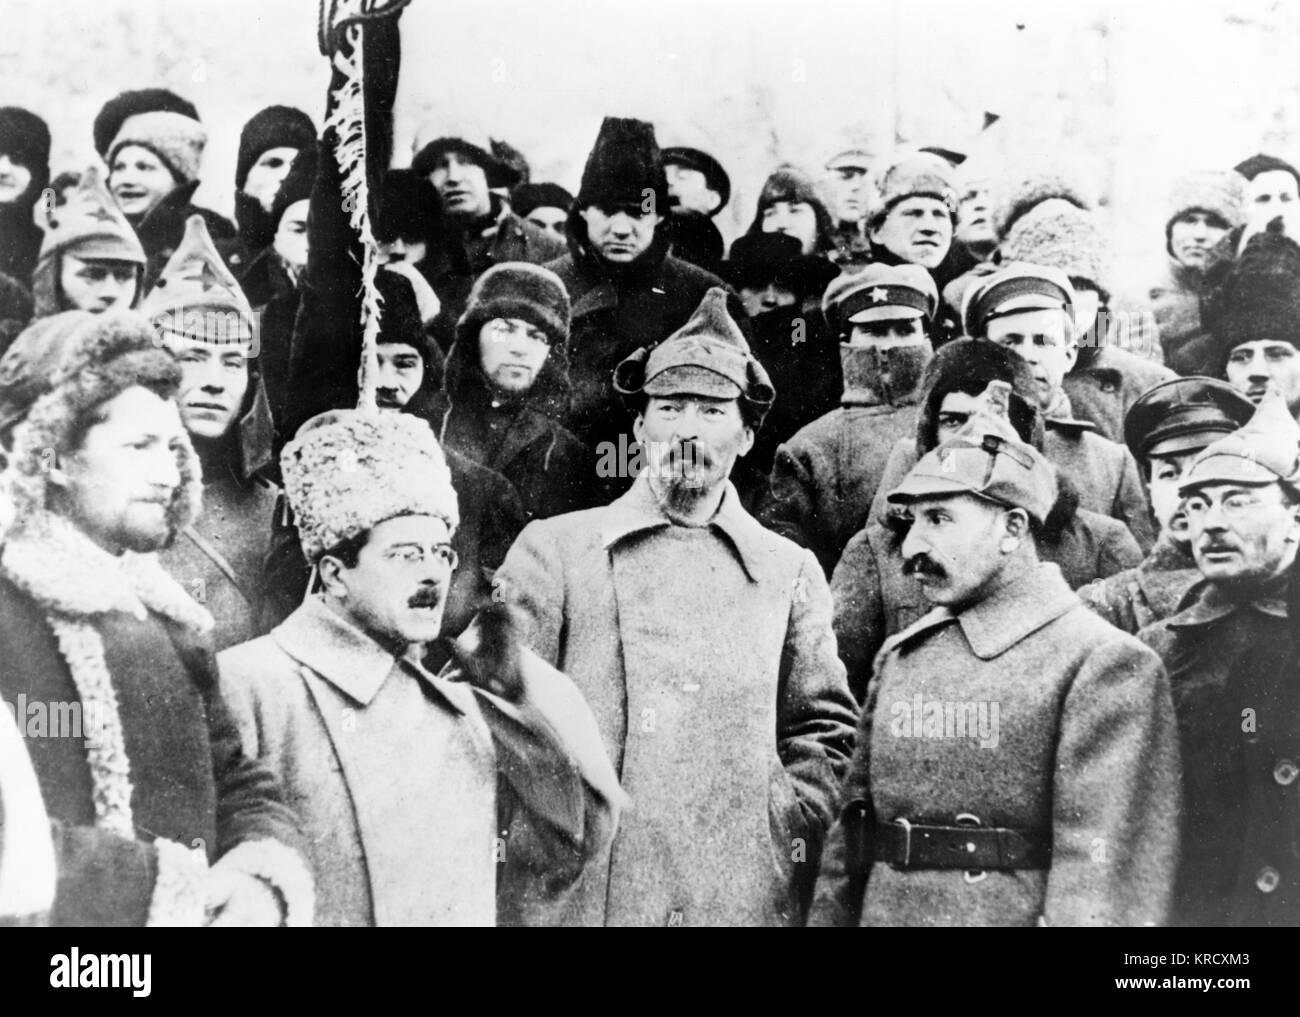 FELIX EDMUNDOVICH DZERZHINSKY Russian revolutionary, the  first head of the Soviet  secret police : photographed - Stock Image